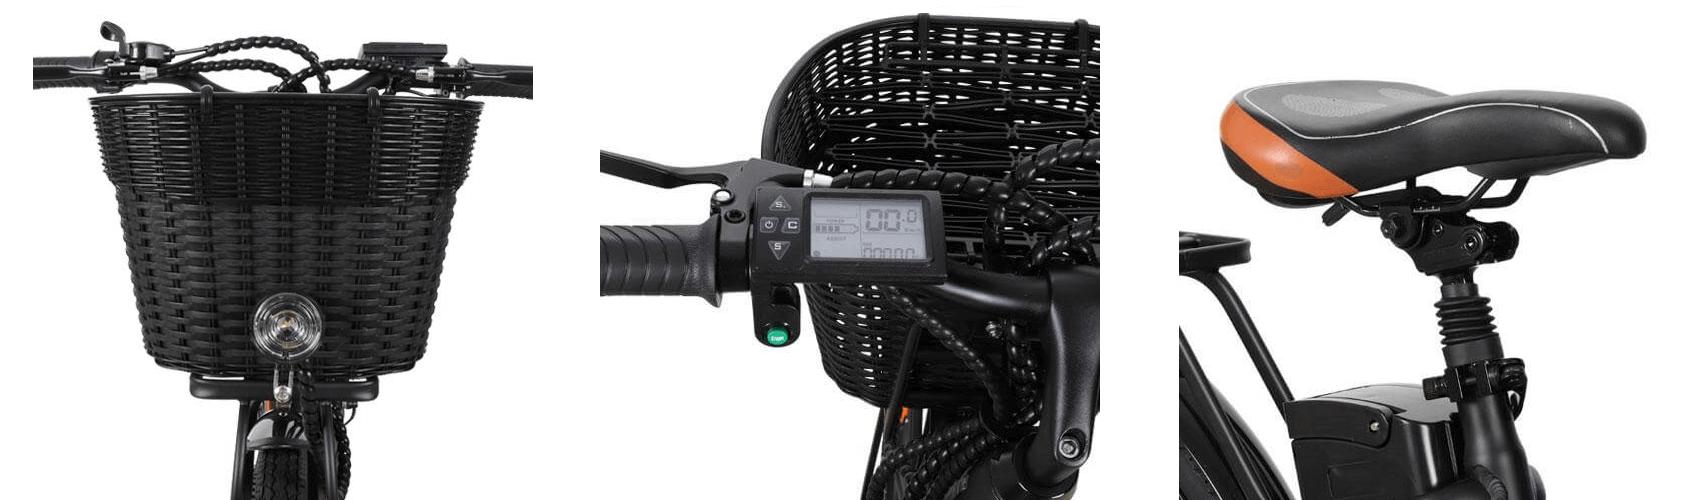 elektricni bicikl RKS XT-1 banner details (1)